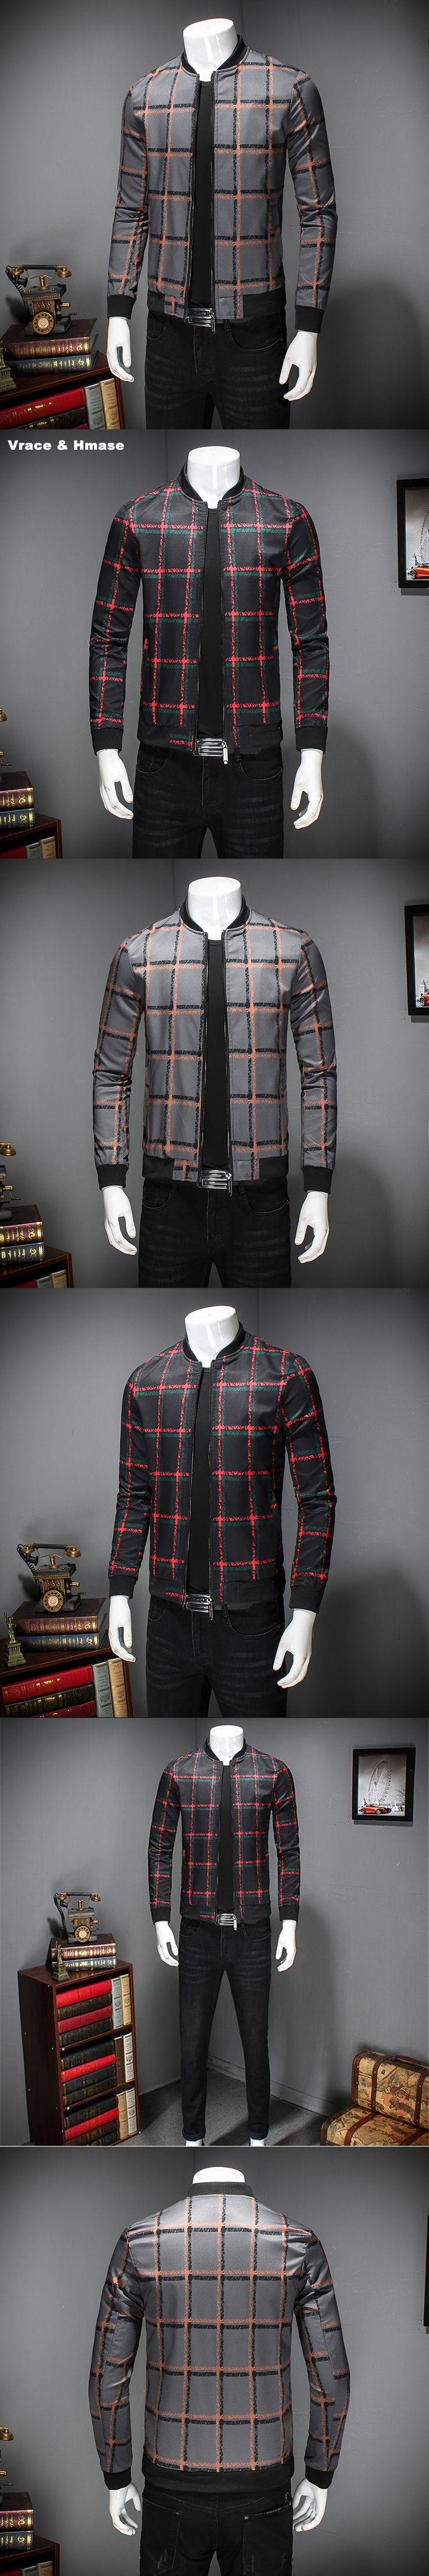 J17019 European American style 3D grid printing fashion slim jacket Autumn 2017 New high-quality stand collar jackets men M-5XL